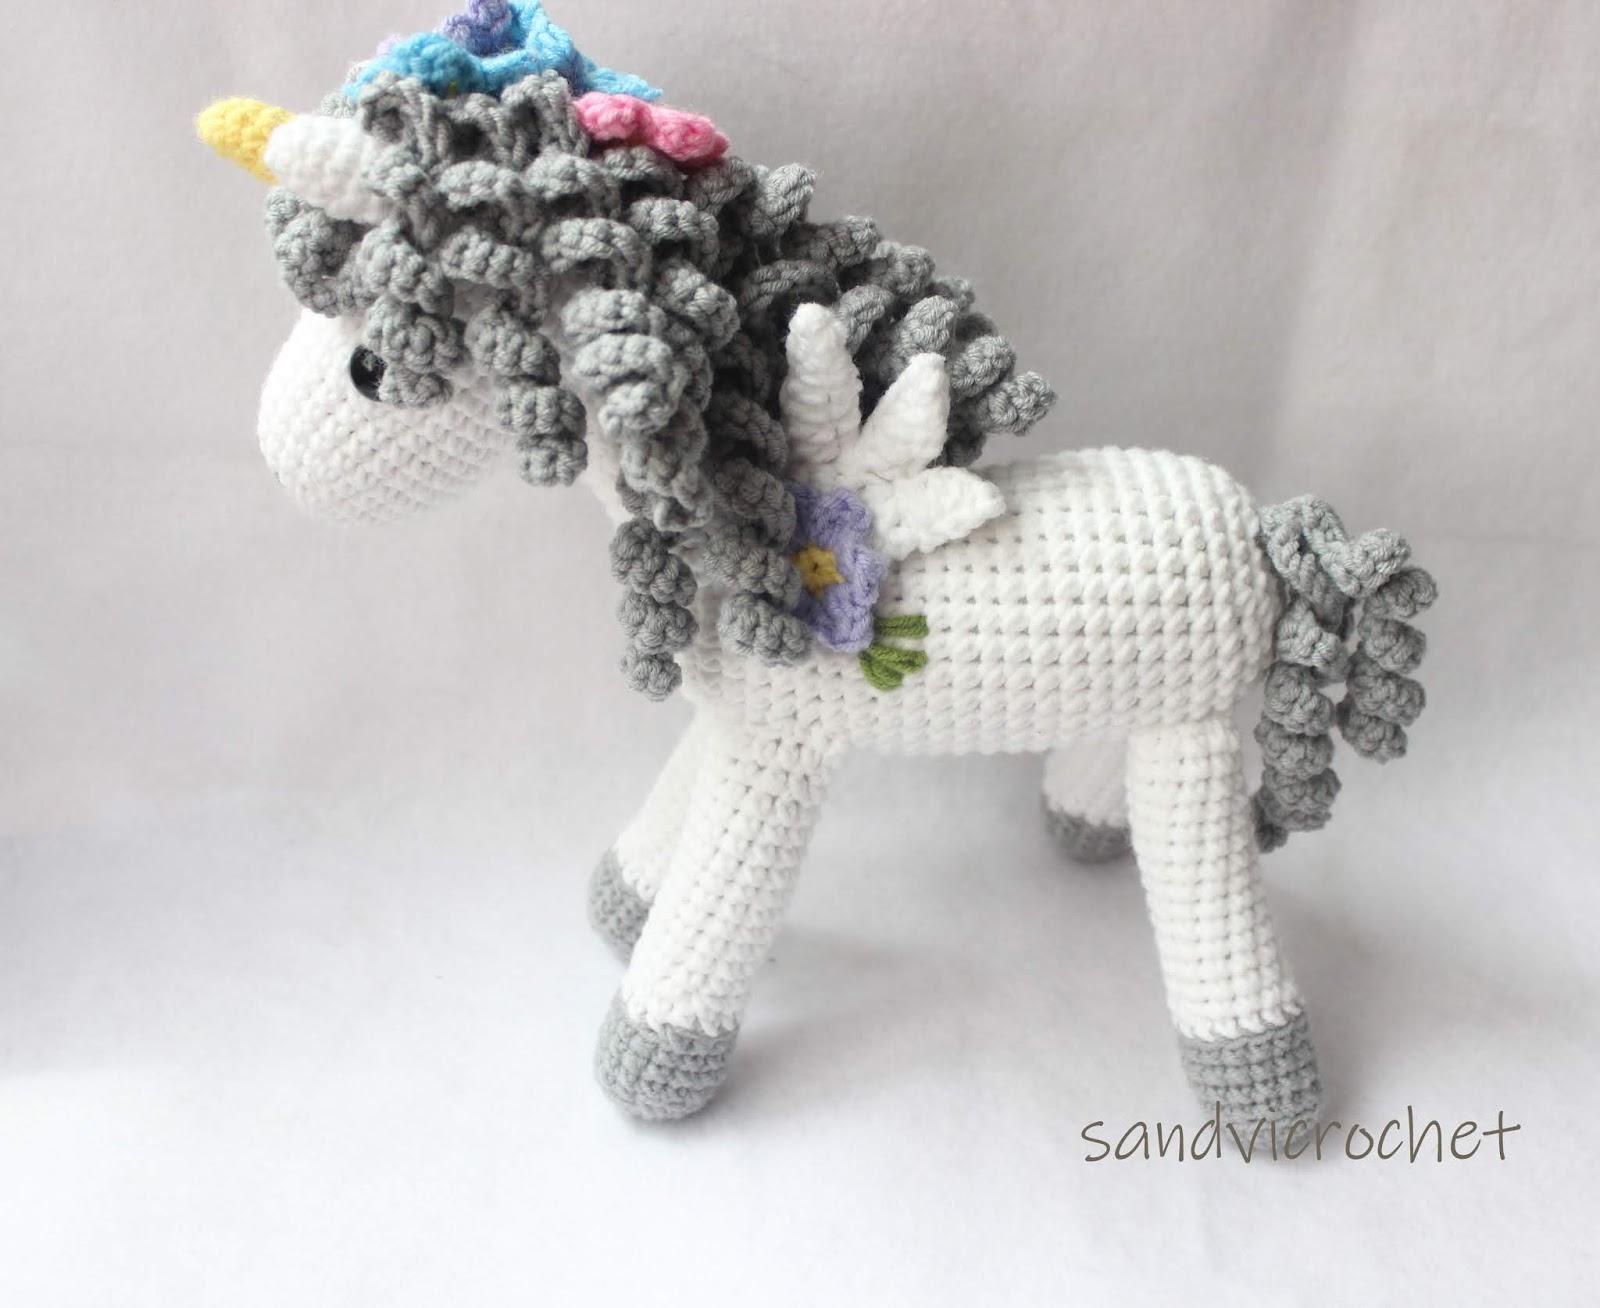 sandvicrochet: Amigurumi Unicorn